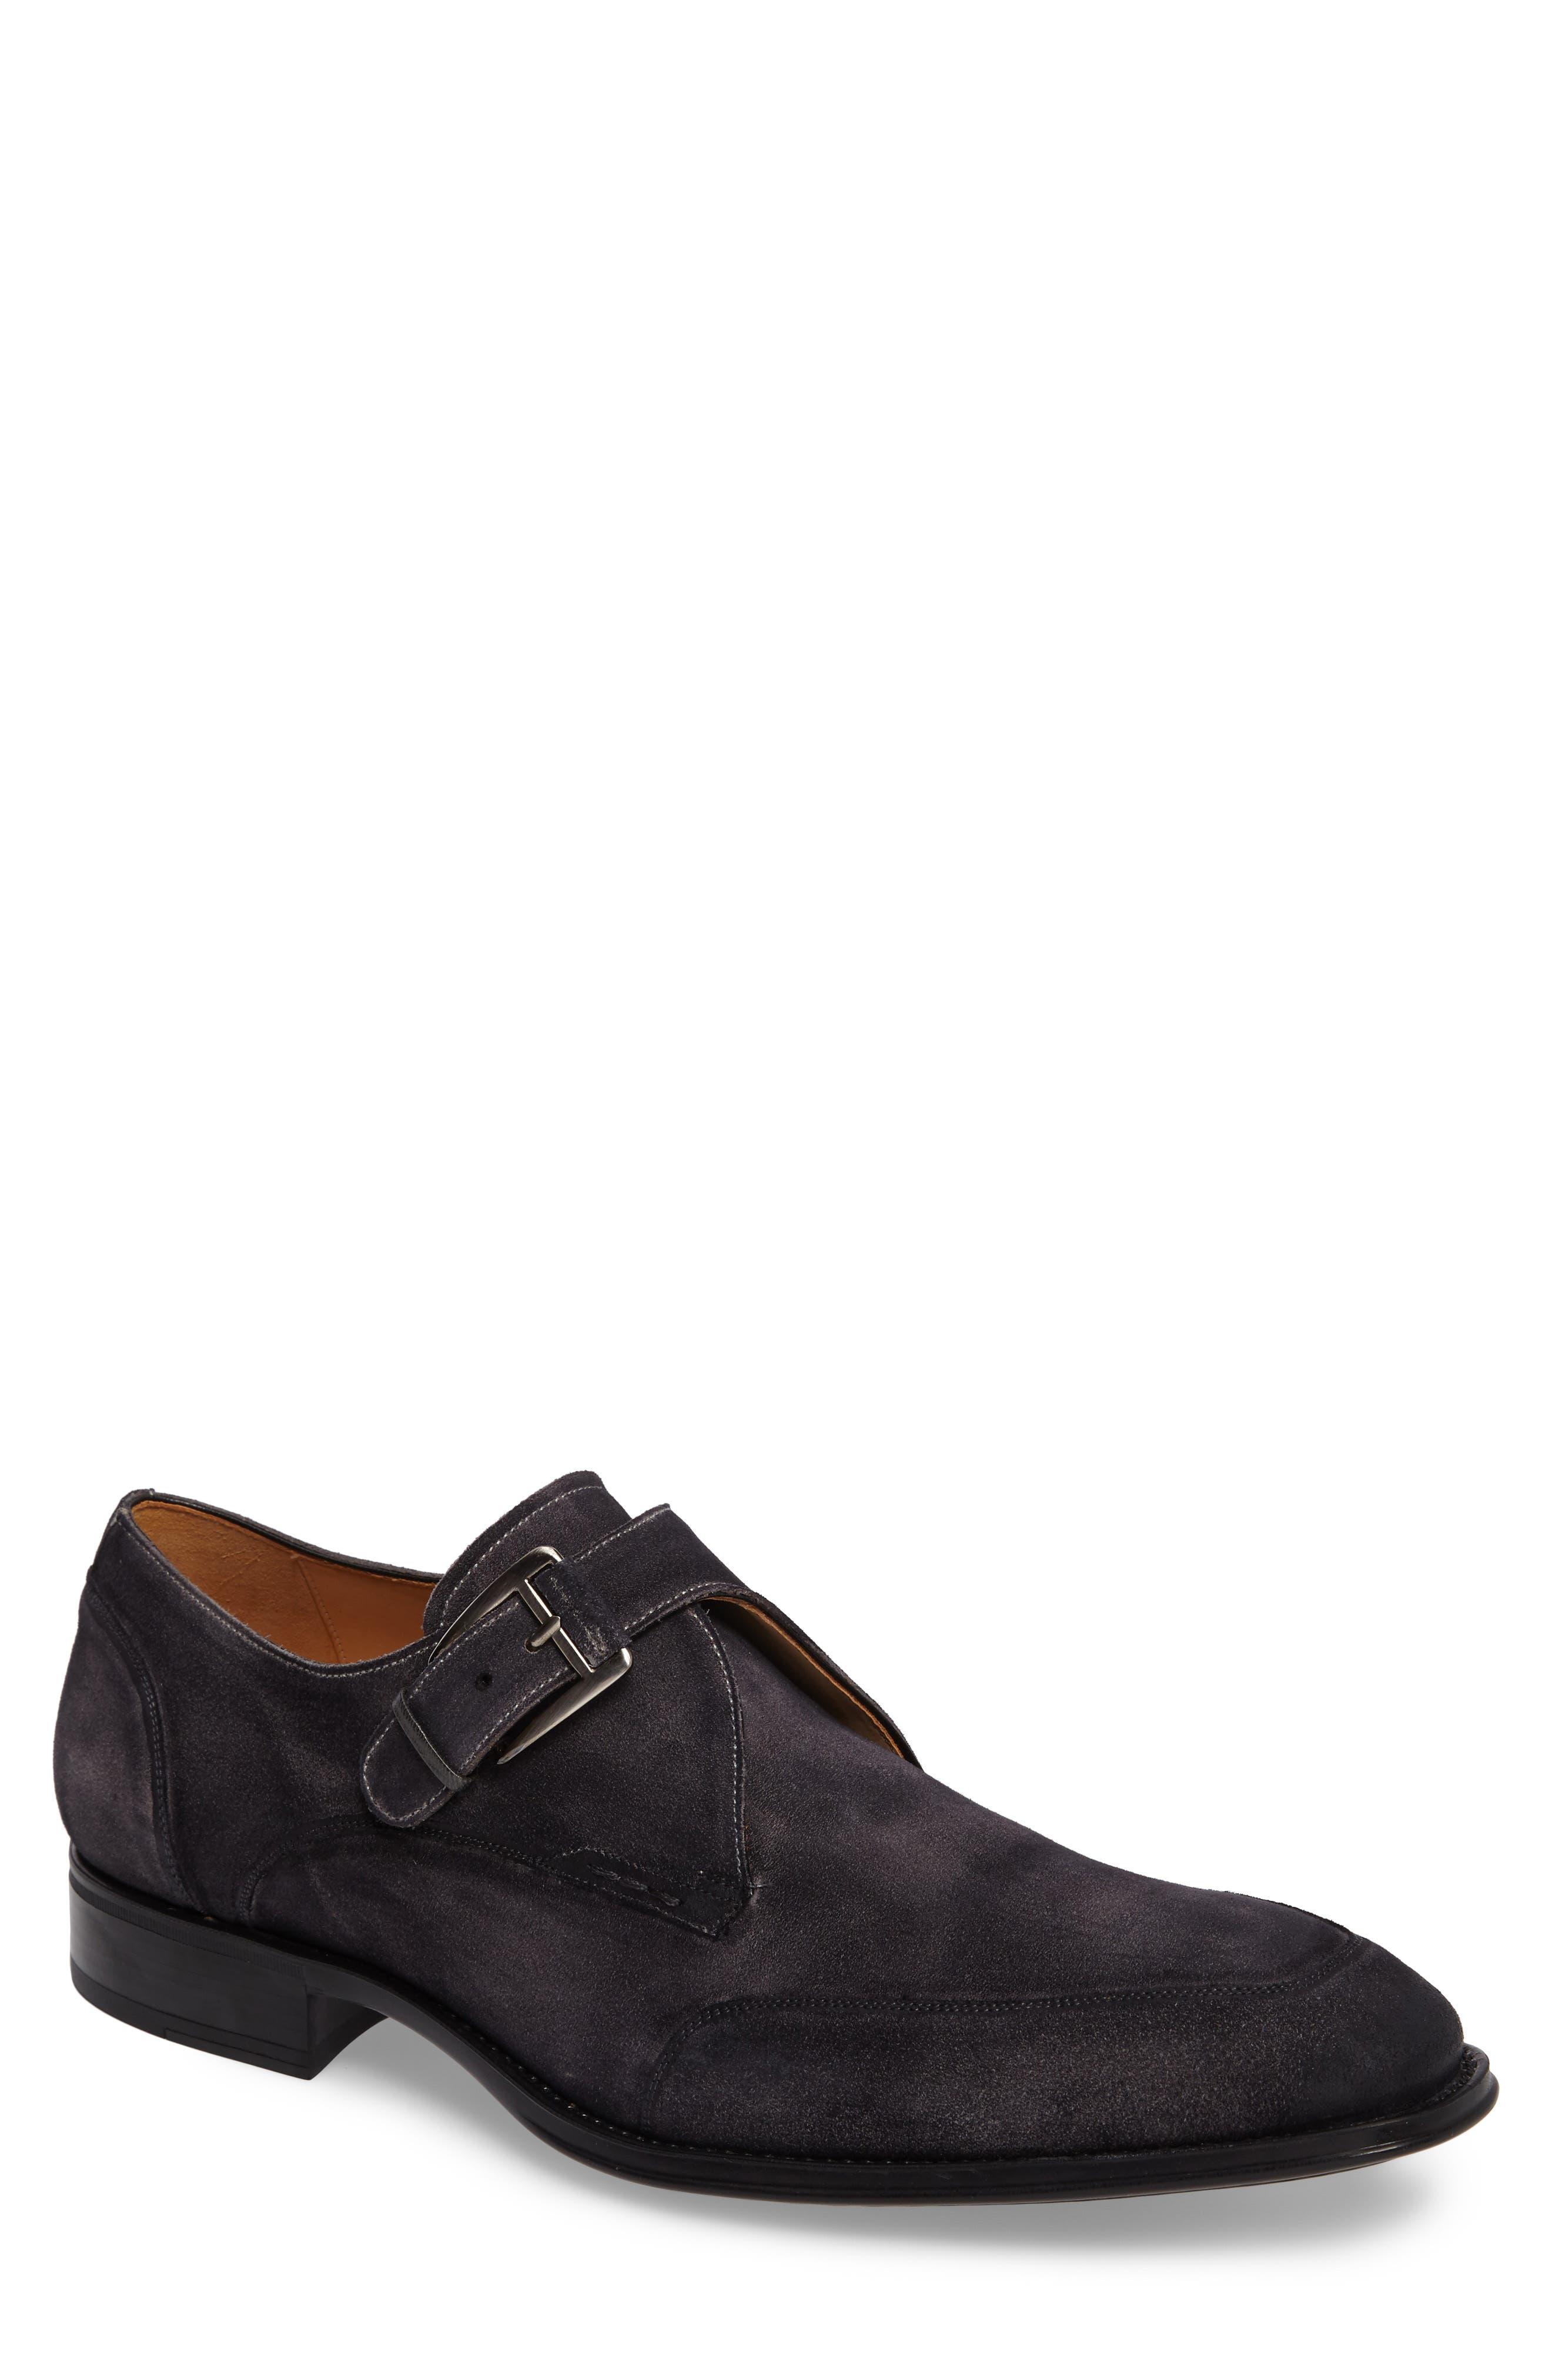 Baza Monk Strap Shoe,                             Main thumbnail 1, color,                             020